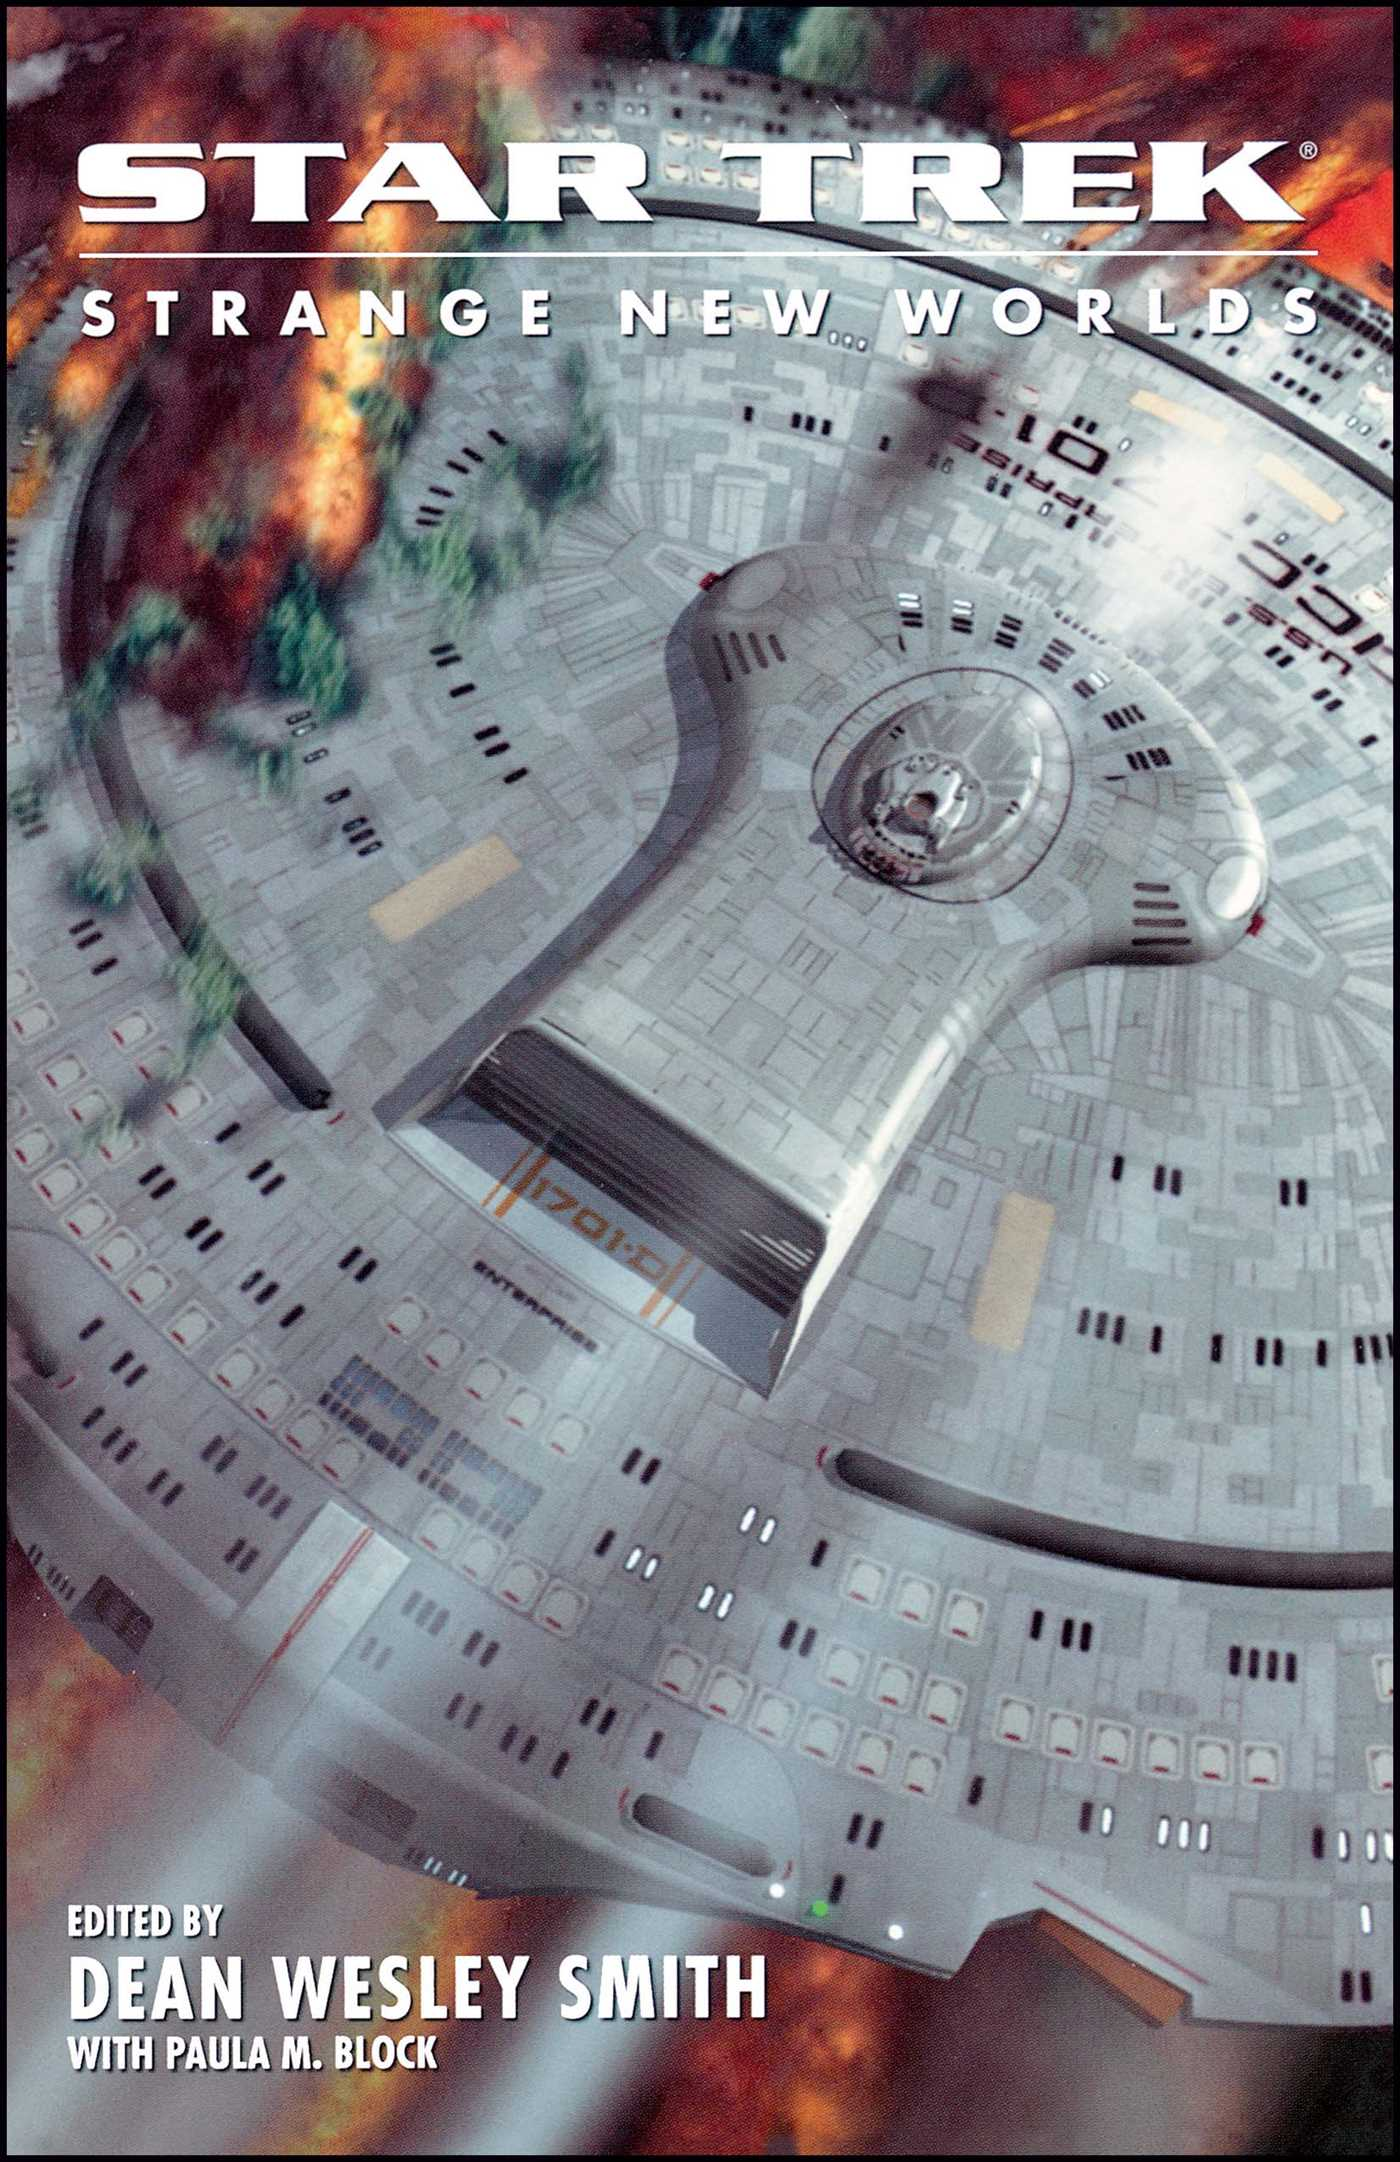 Star trek strange new worlds x 9781416544388 hr